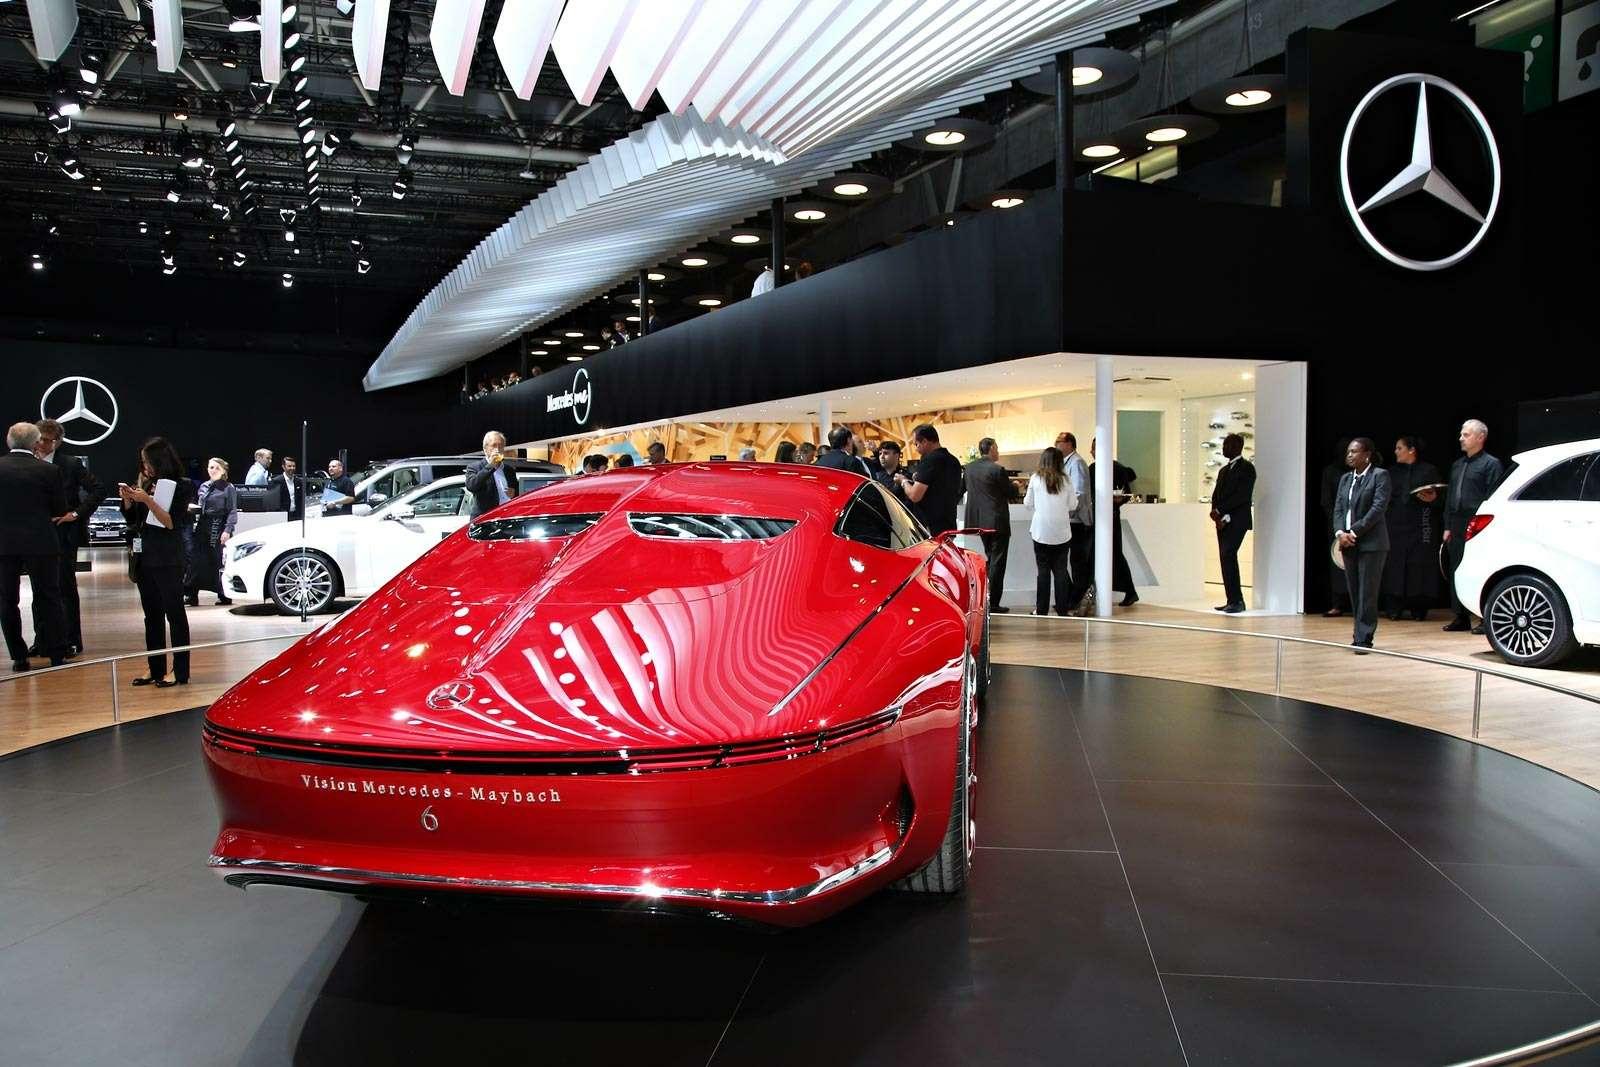 Самый красивый автомобиль Парижа: Vision Mercedes-Maybach 6завоевывает сердца— фото 643569